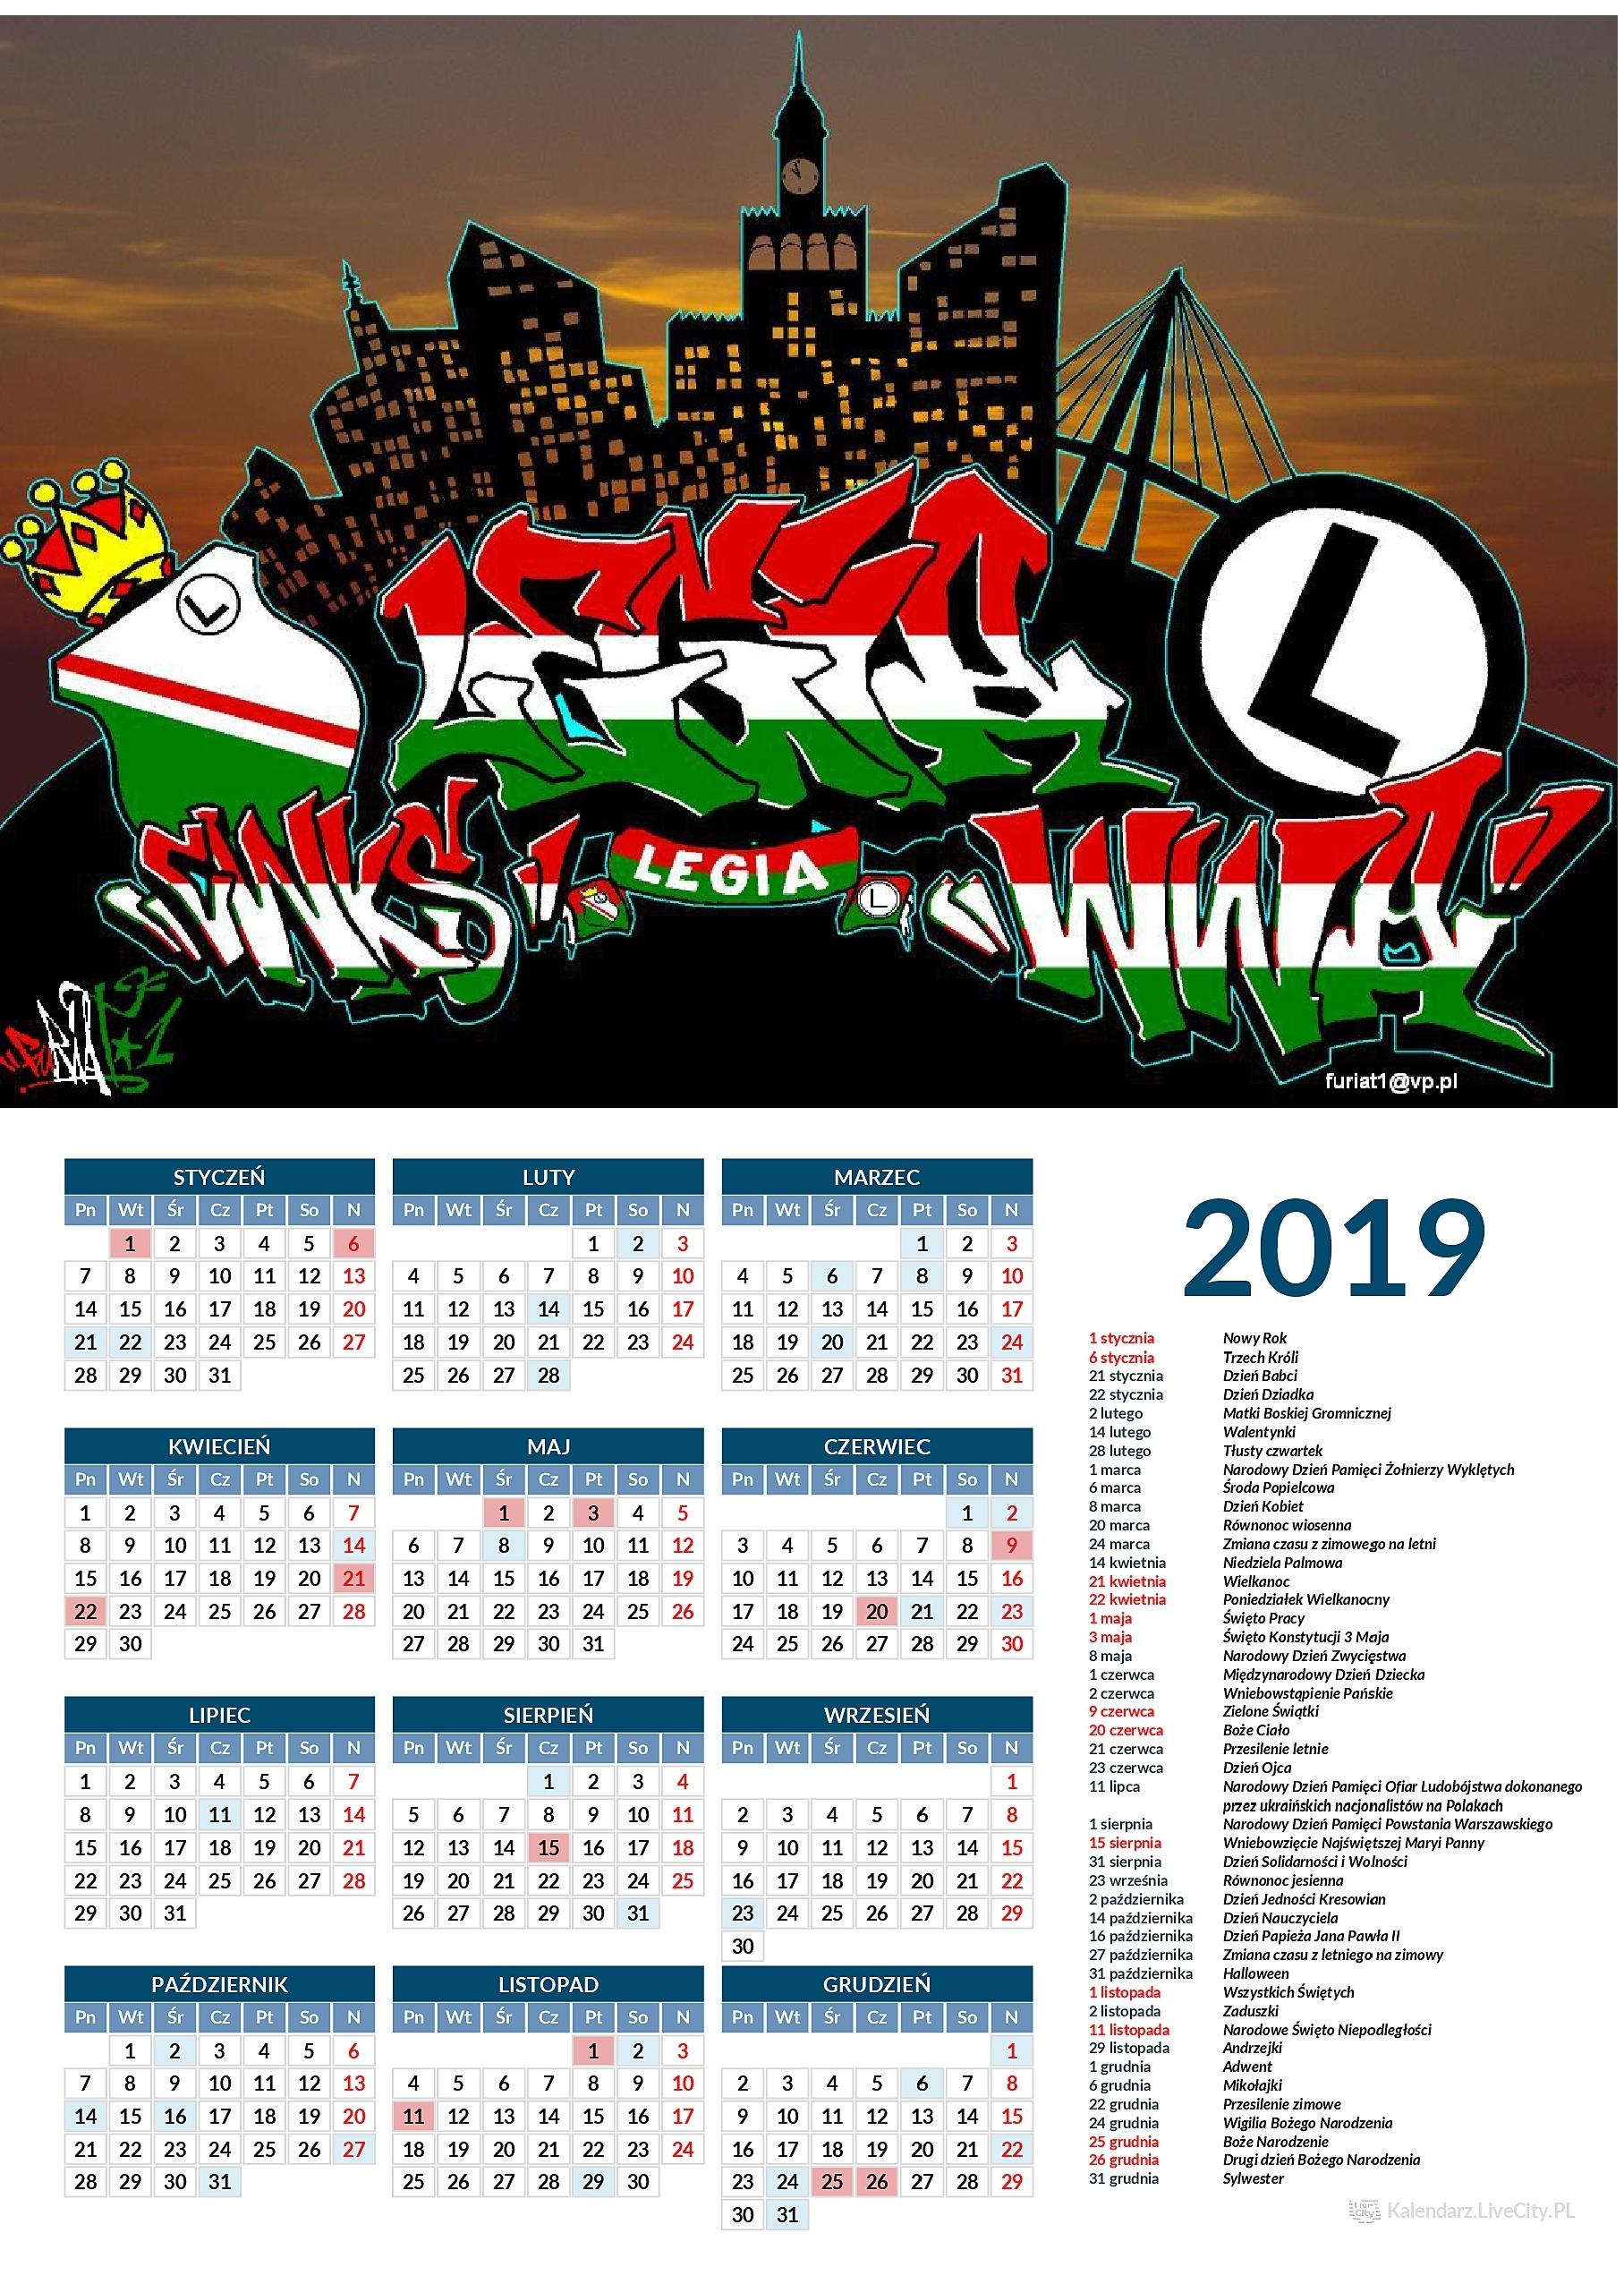 Kalendarz 2019 LEGIA CWKS